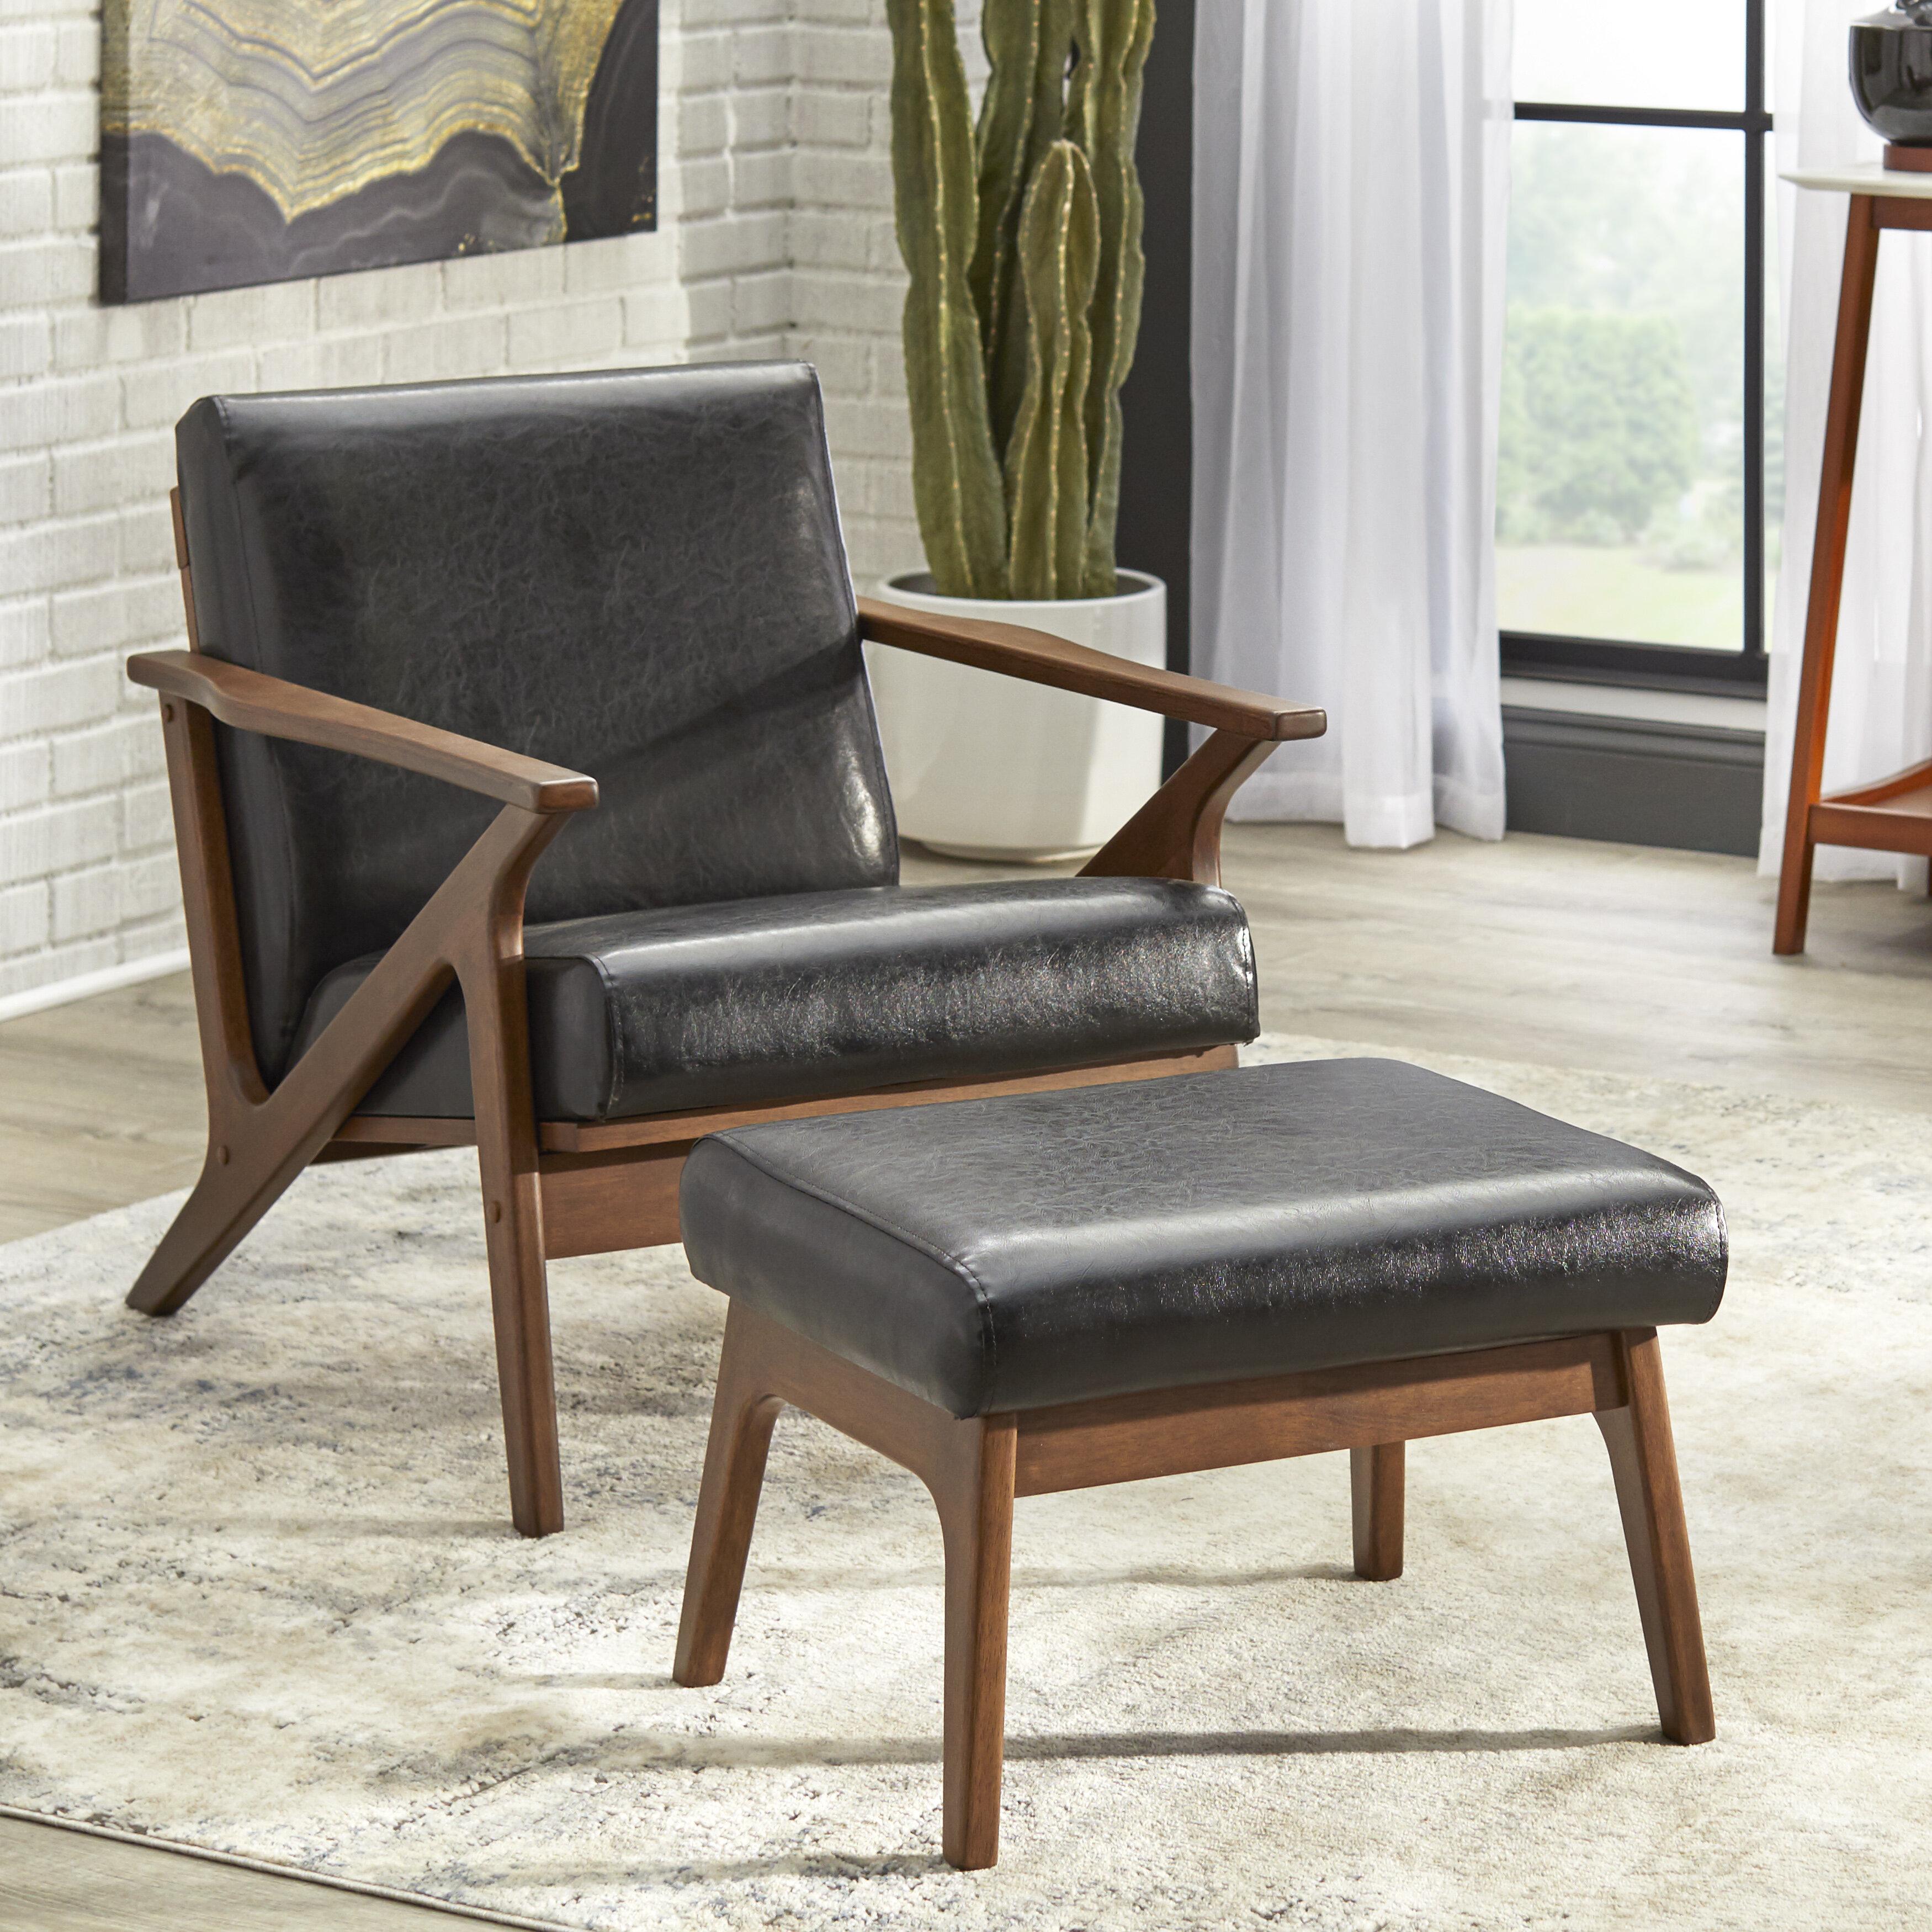 Union Rustic Choudhury 28 W Faux Leather Armchair And Ottoman Reviews Wayfair